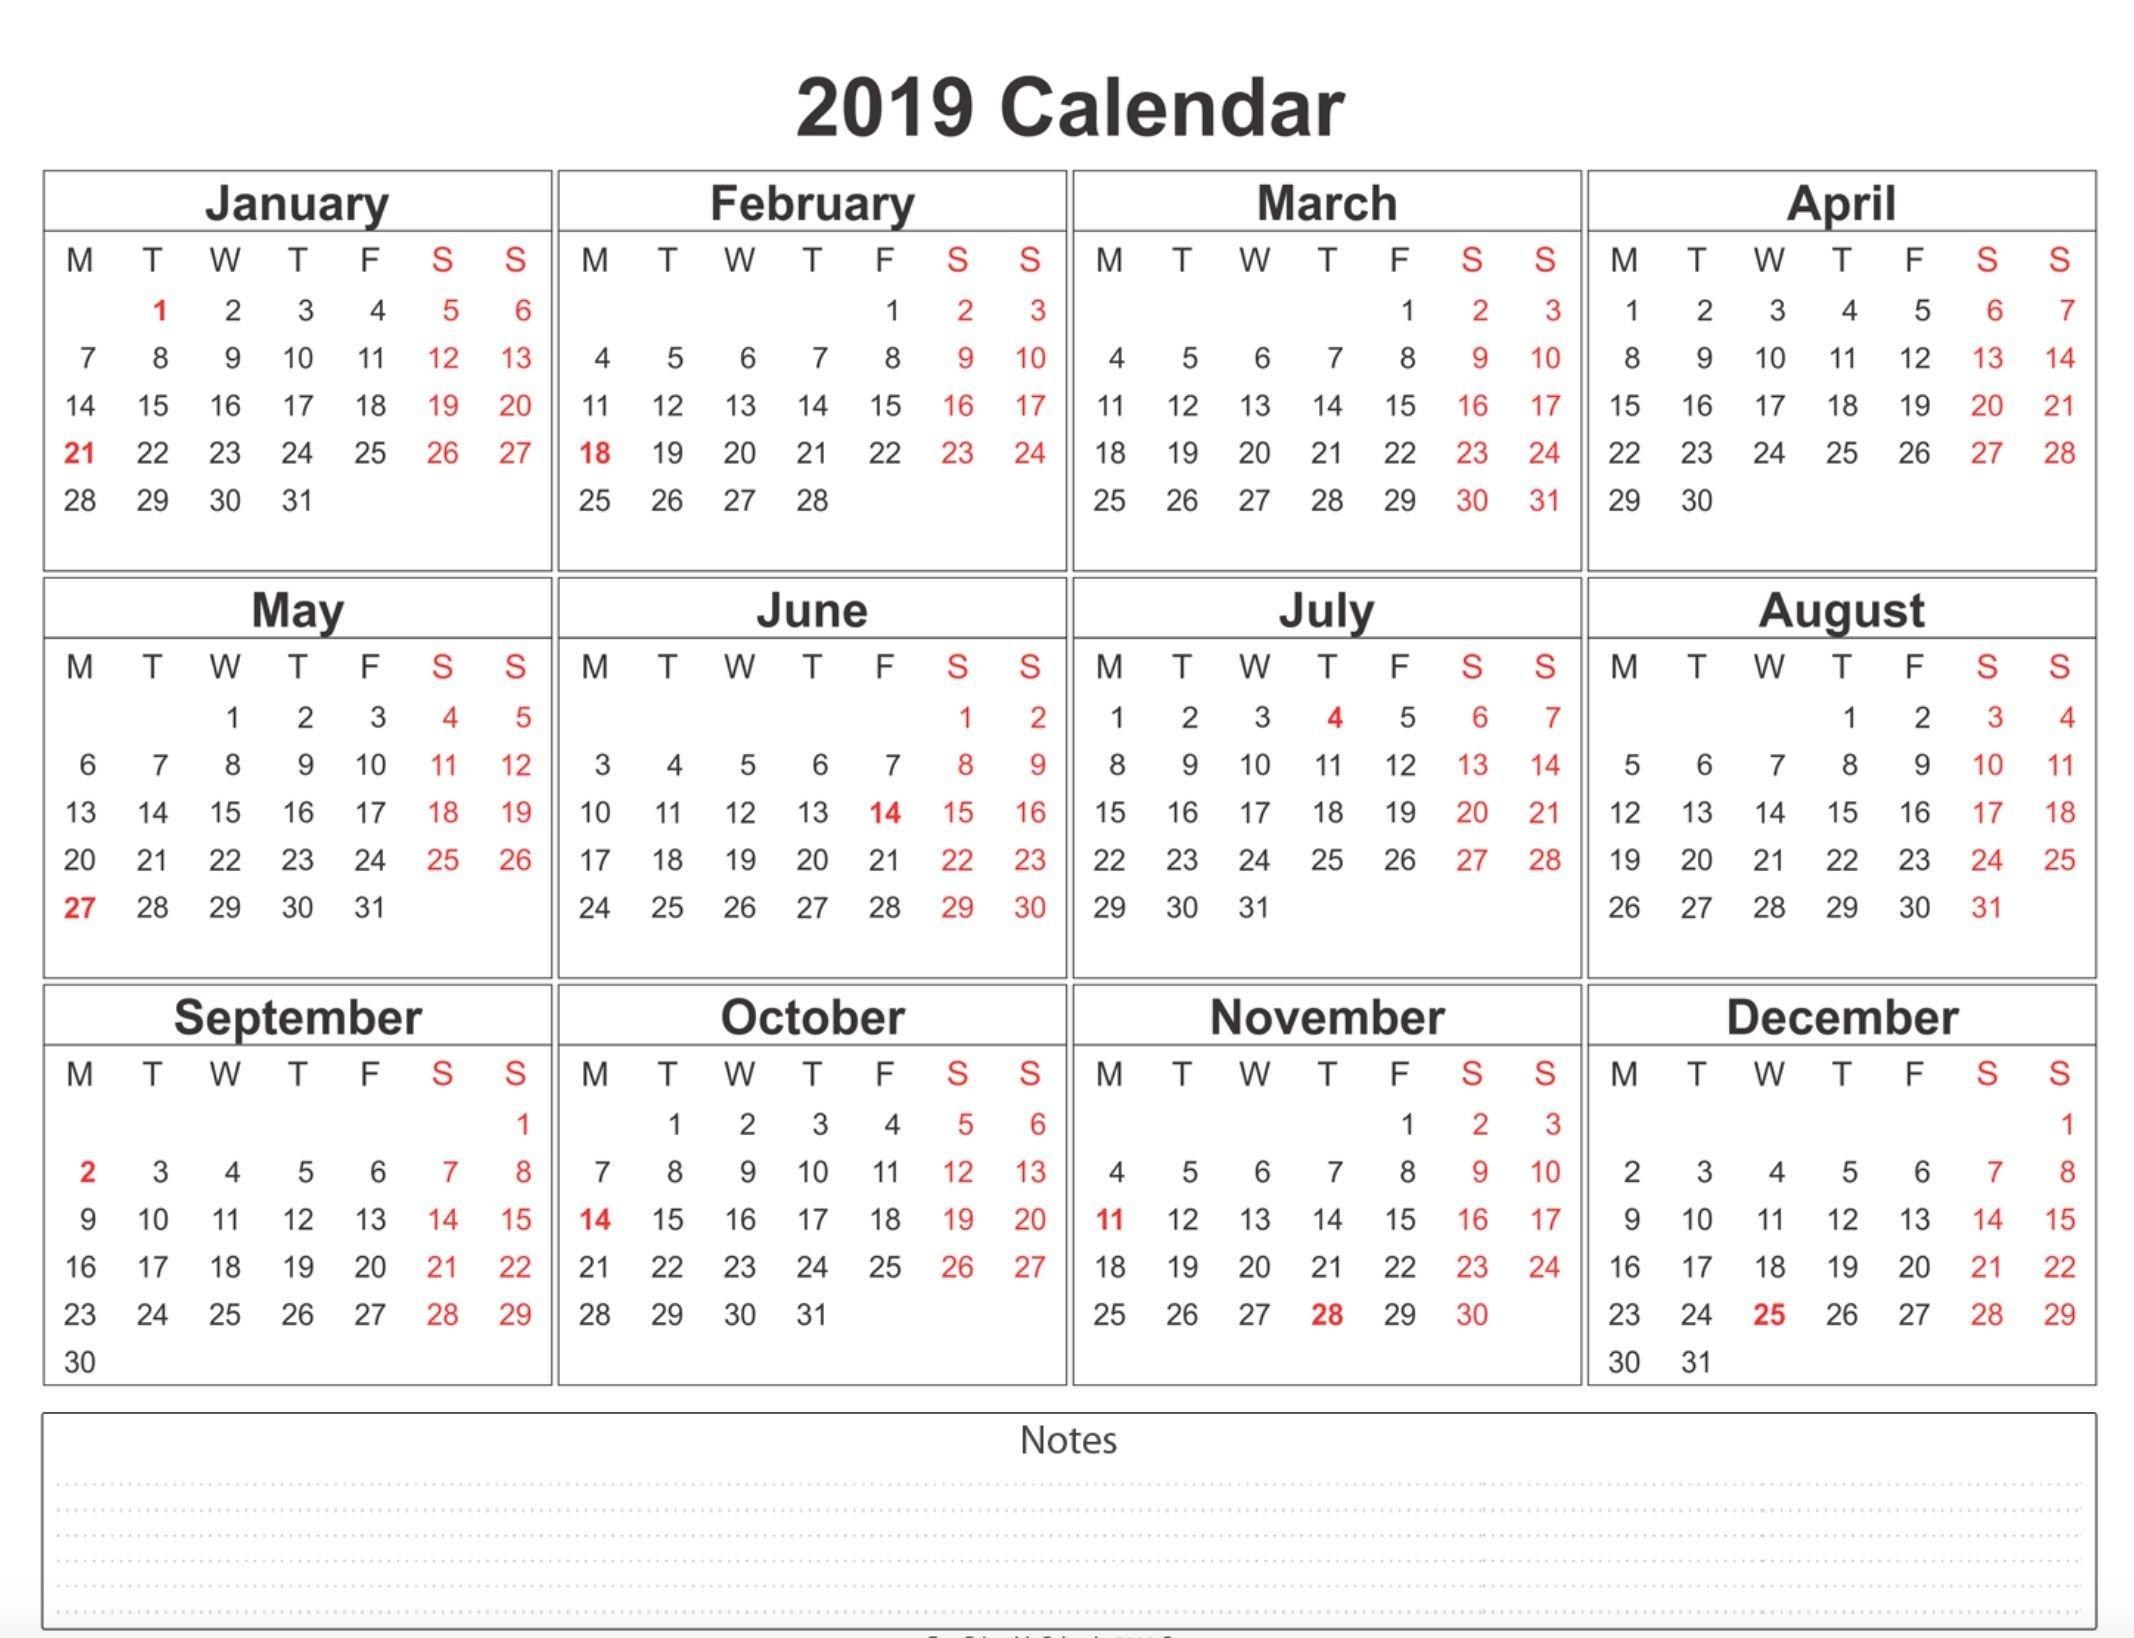 2019 Weekly Calendar Printable | 2019 Calendars | 12 Month Calendar Calendar 2019 With Holidays Usa Printable